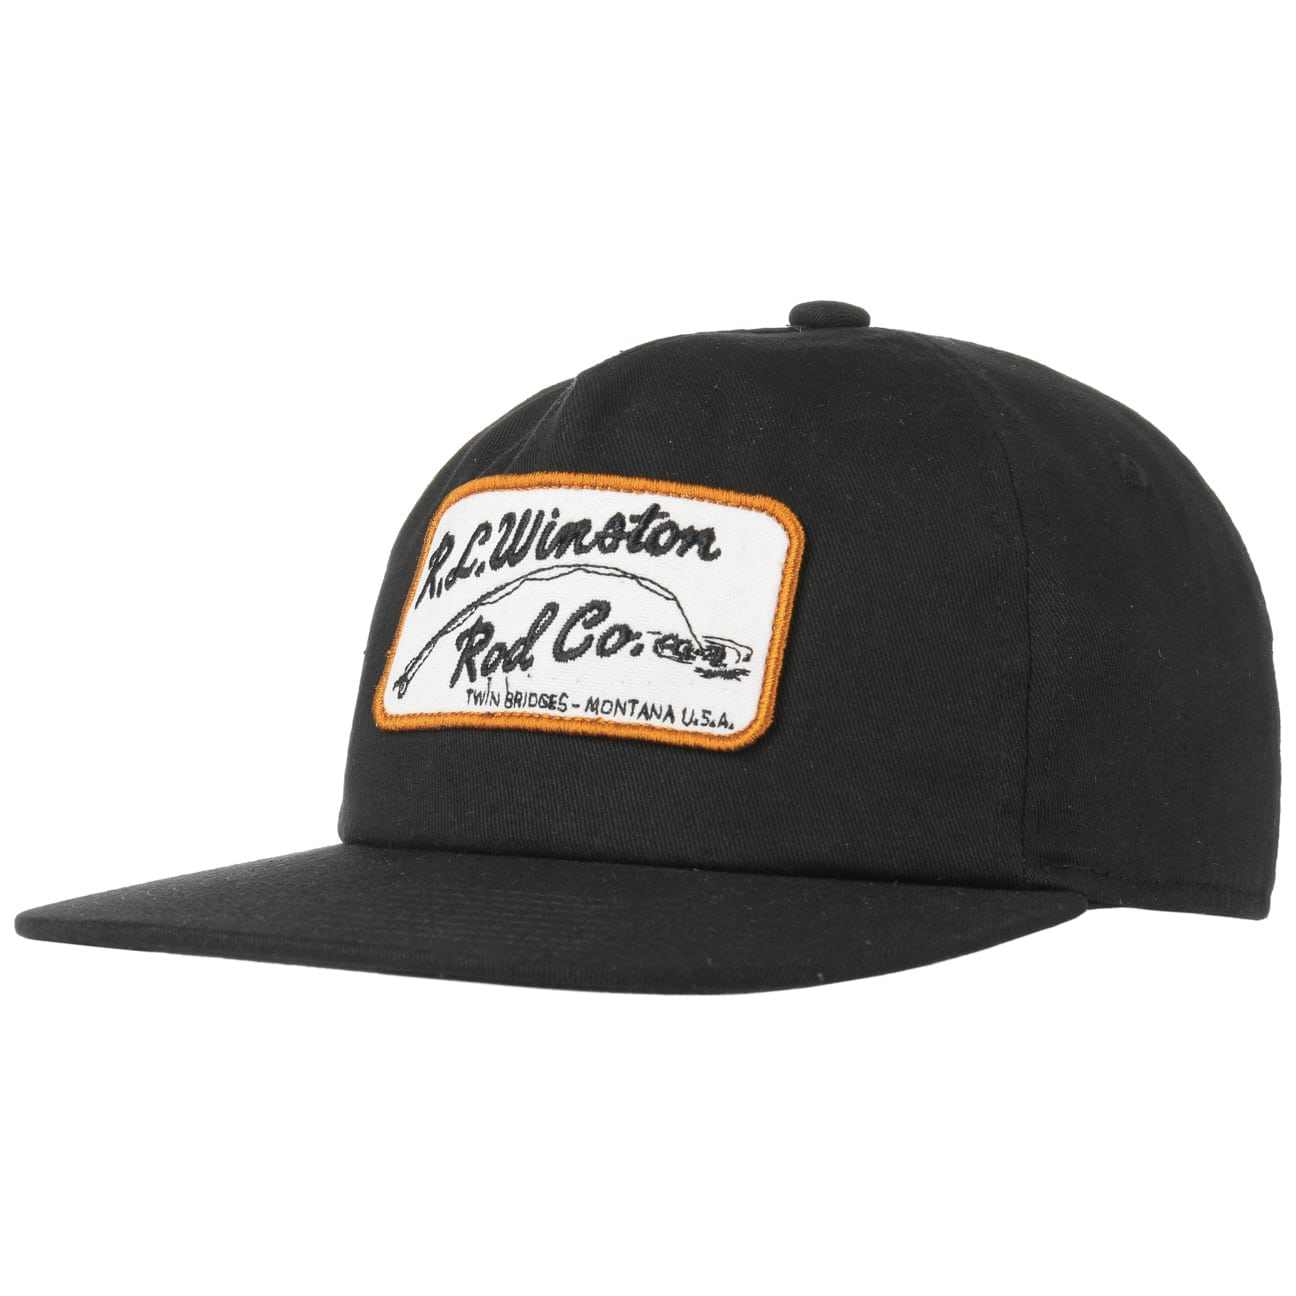 Gorra The Winston SE Strapback by Coal  gorra de baseball